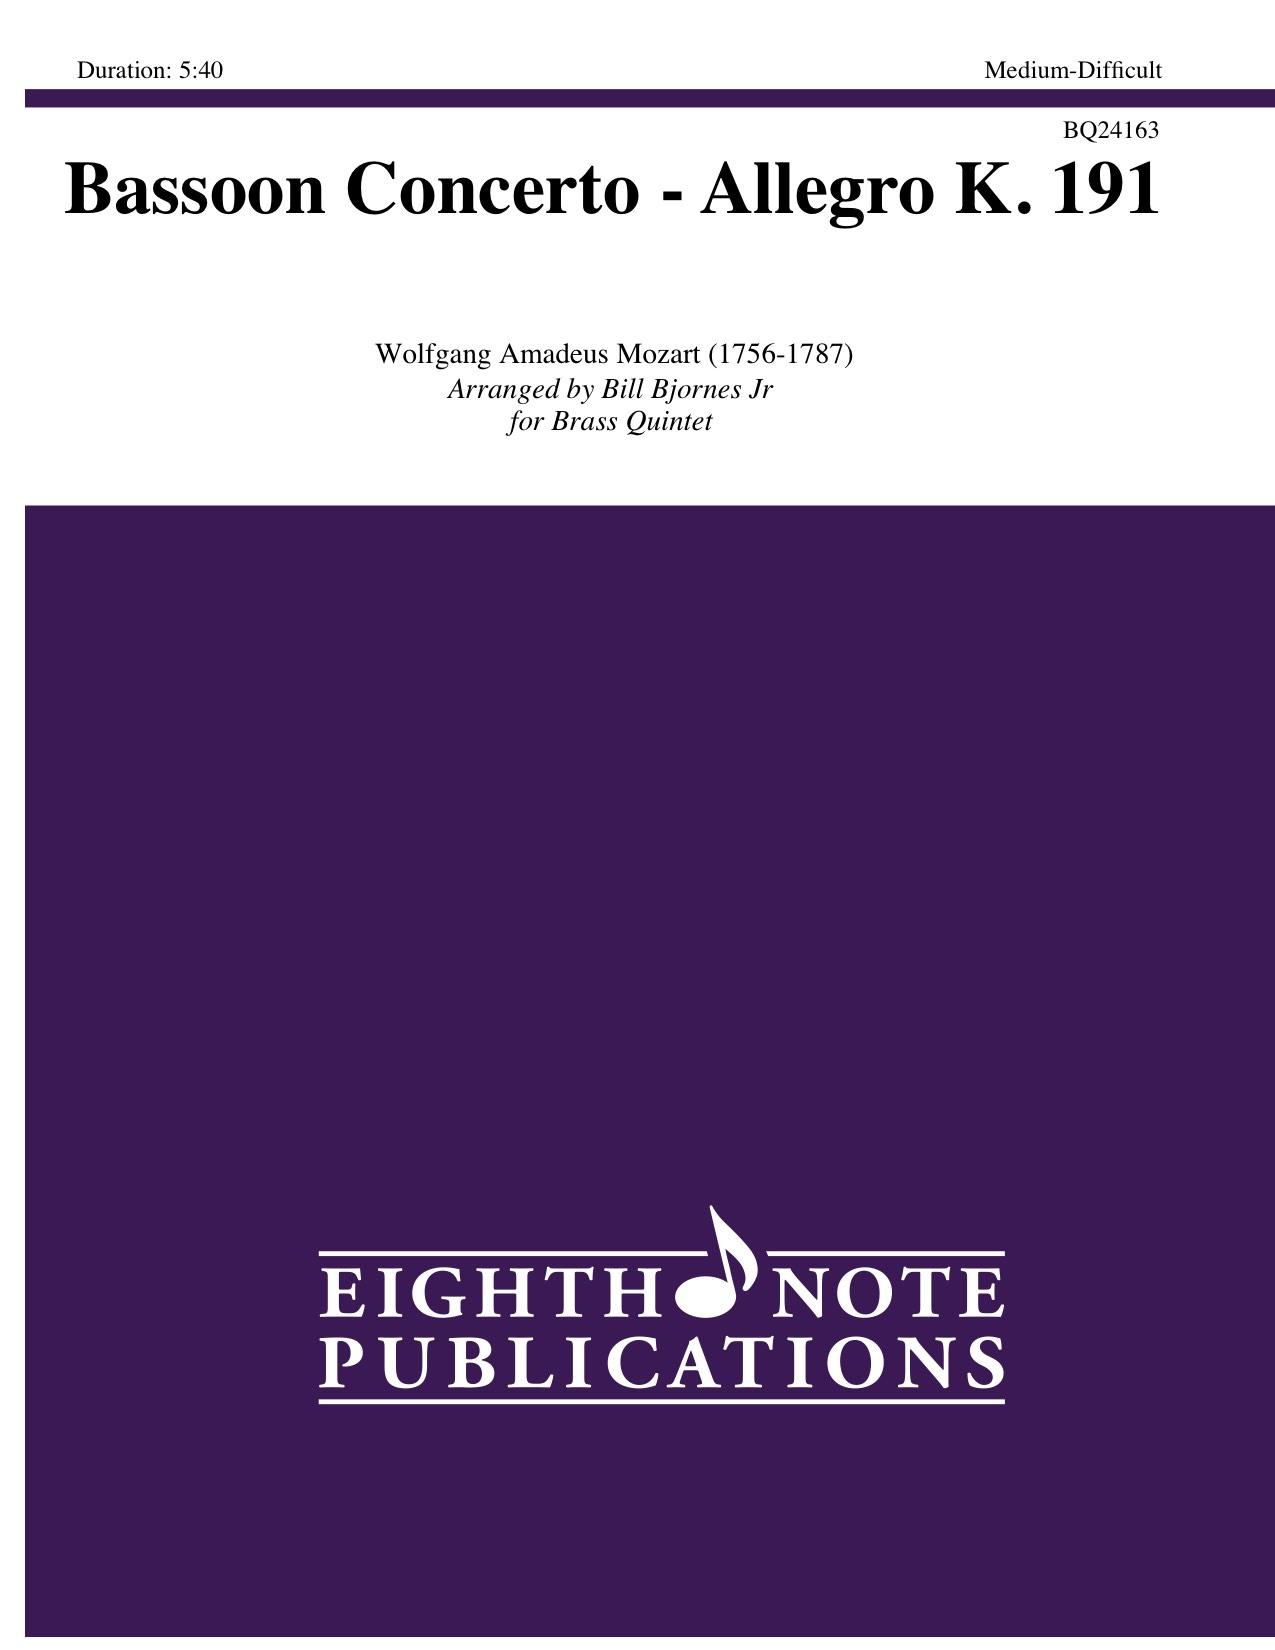 Bassoon Concerto - Allegro K. 191 - Wolfgang Amadeus Mozart